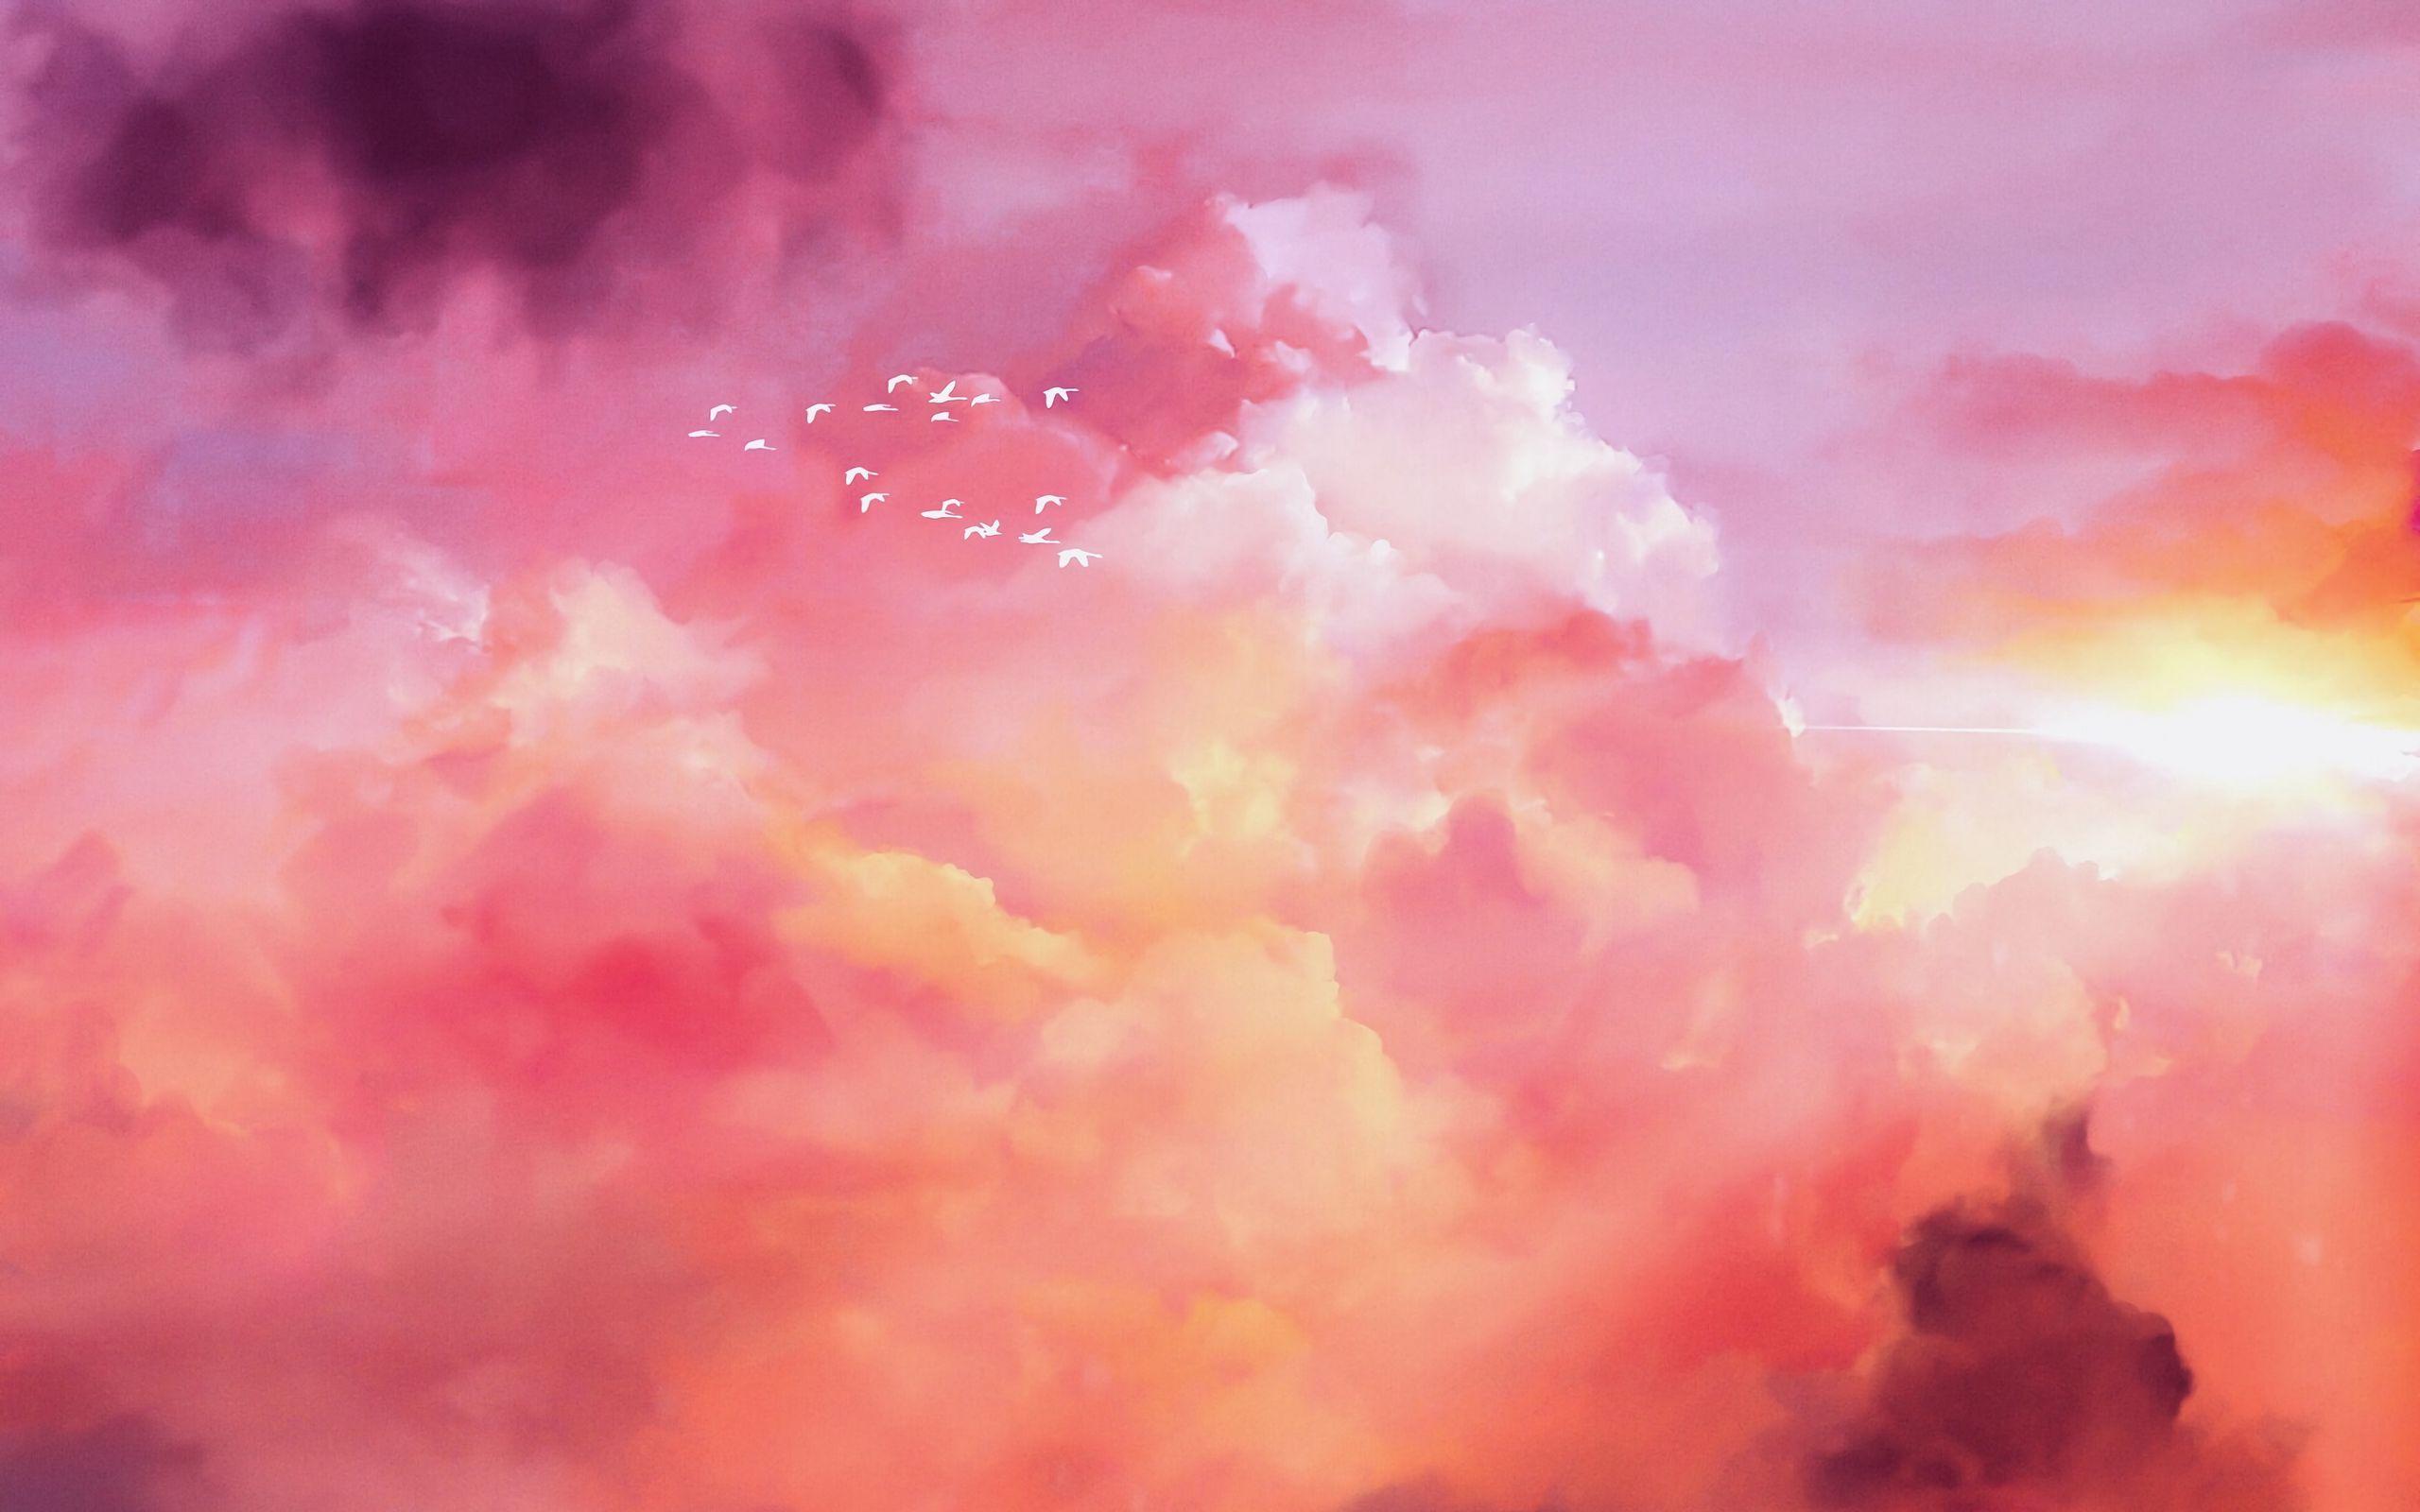 2560x1600 Wallpaper birds, flock, pink, sky